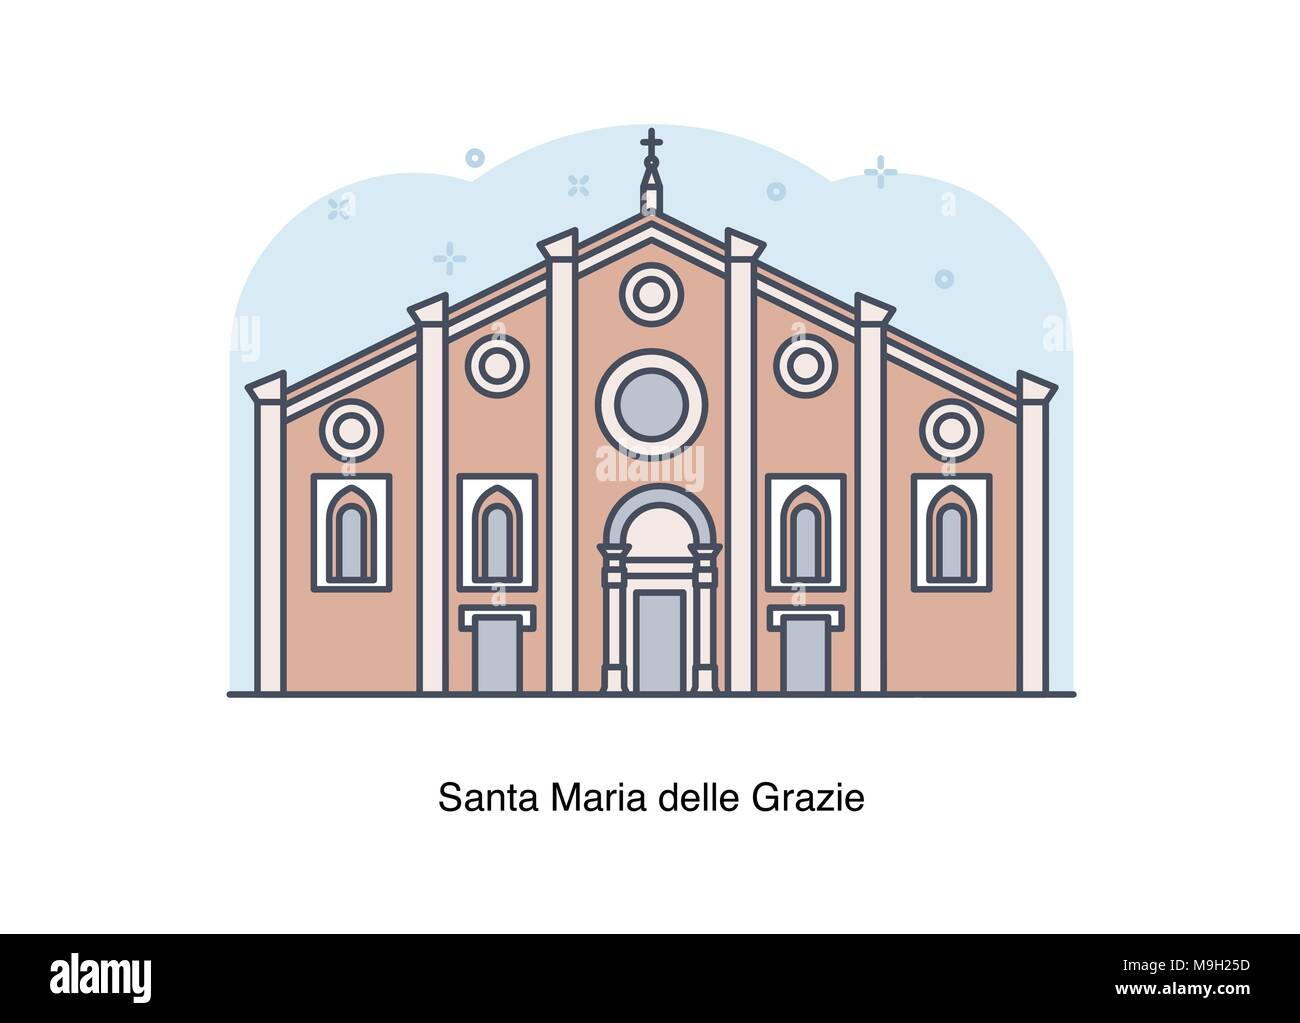 Vector line illustration of Santa Maria delle Grazie, Milan, Italy. - Stock Vector